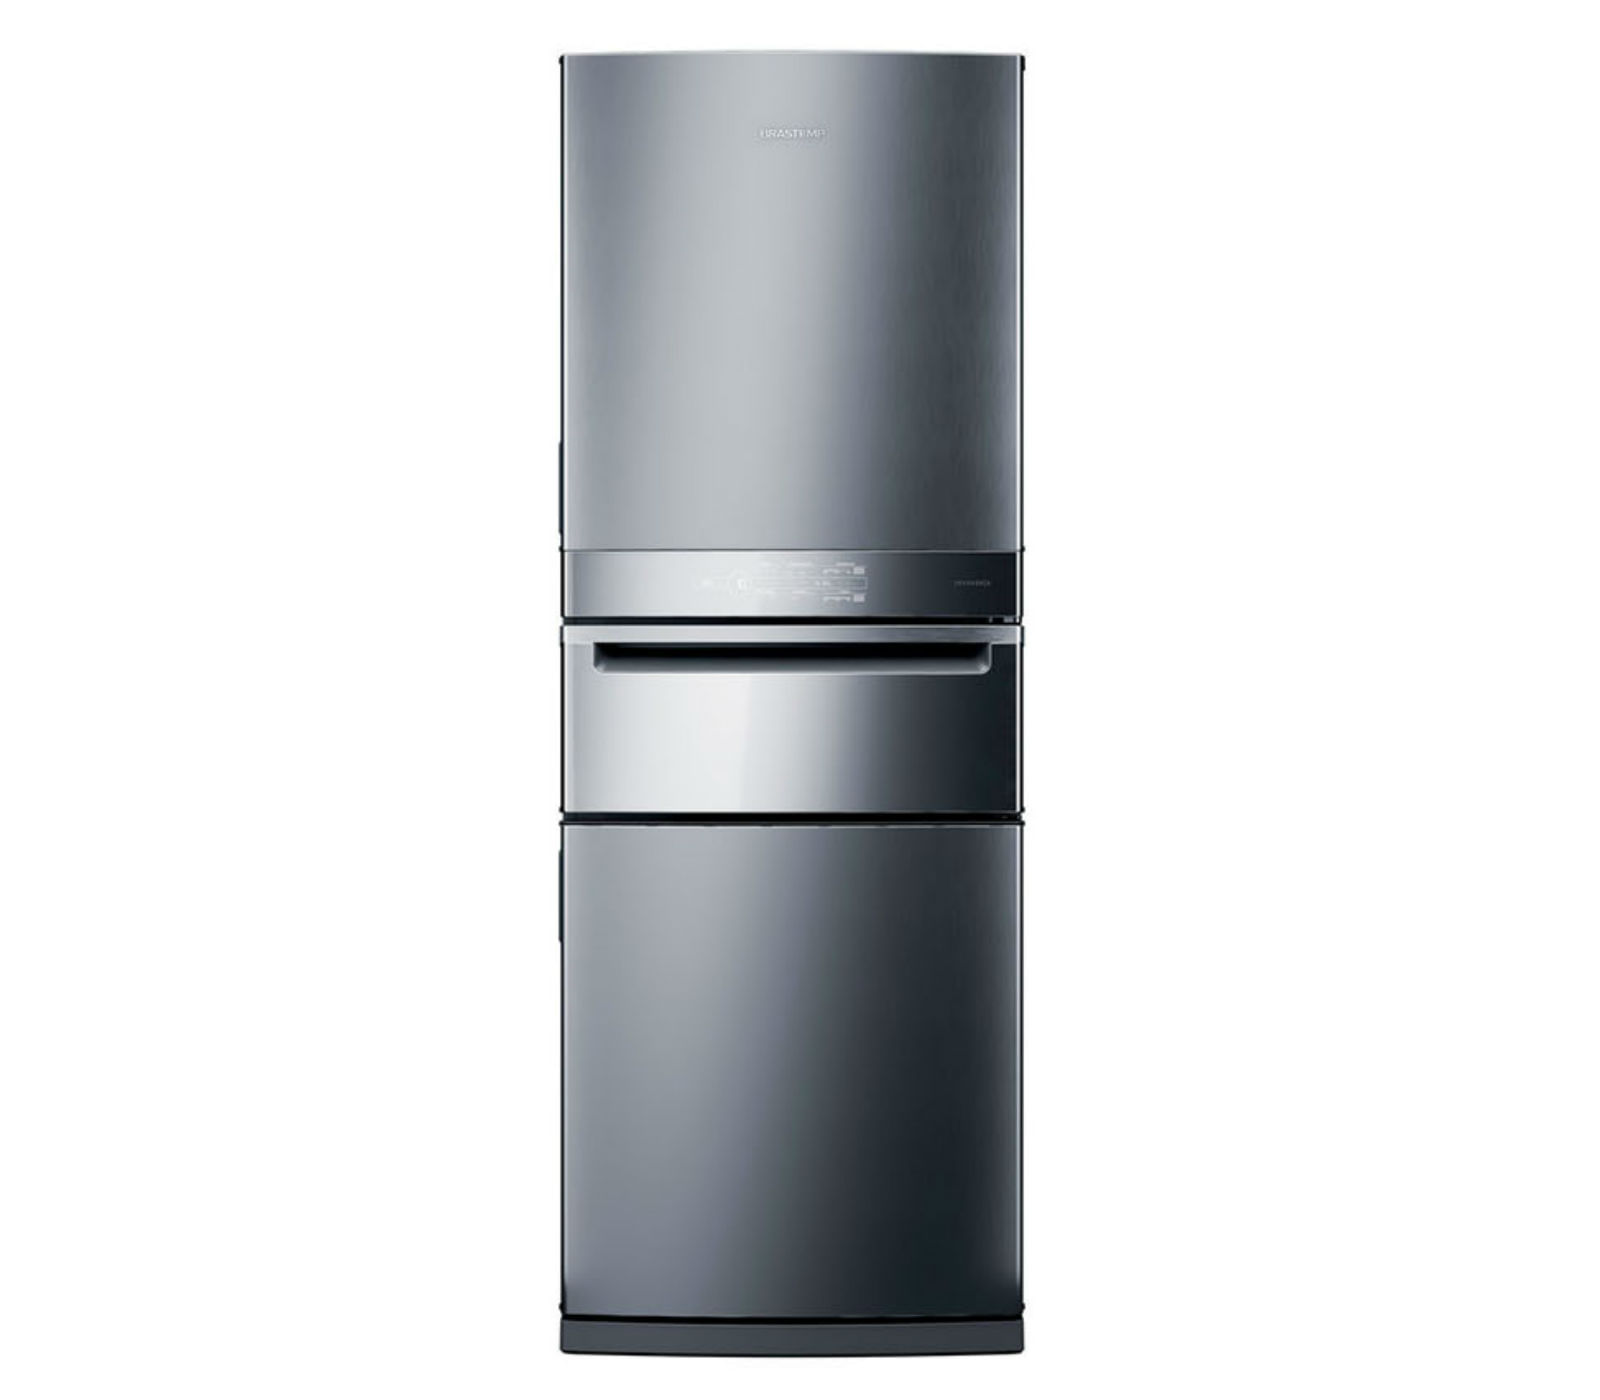 Geladeira Brastemp Inverse 3 Frost Free 419 litros cor Inox com Freeze Control Pro - BRY59AK